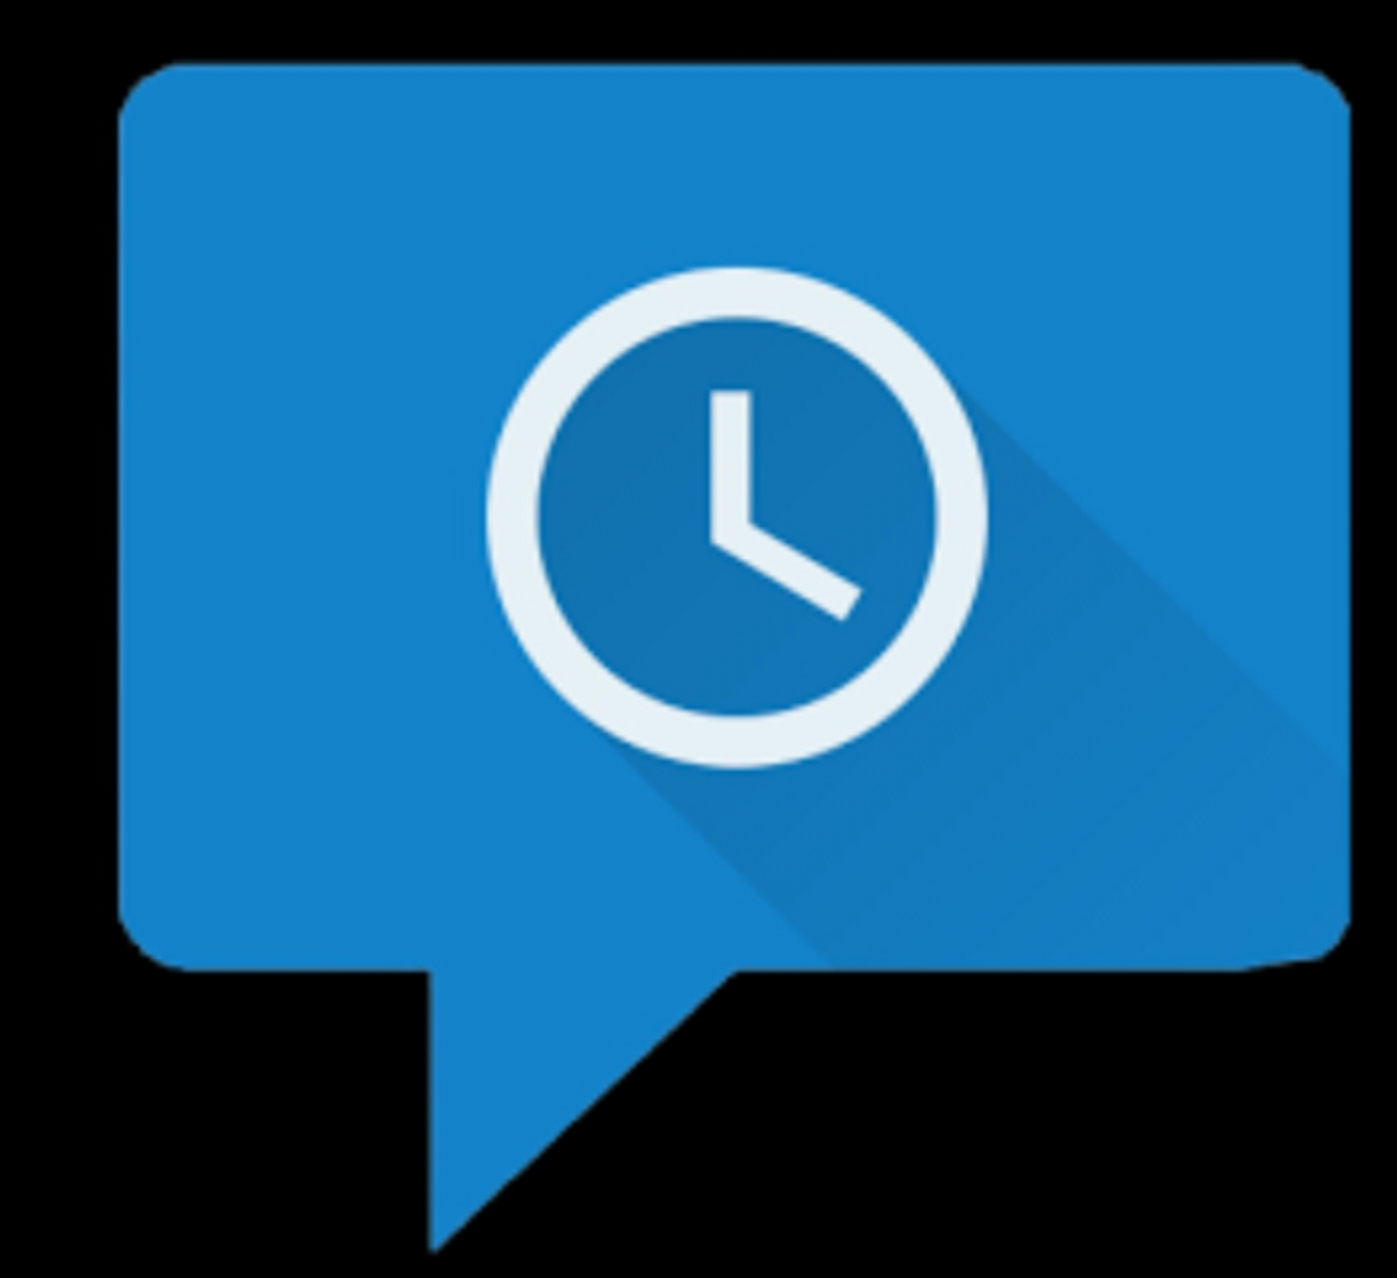 Programmare sms, email e post sui social networks con Schemes